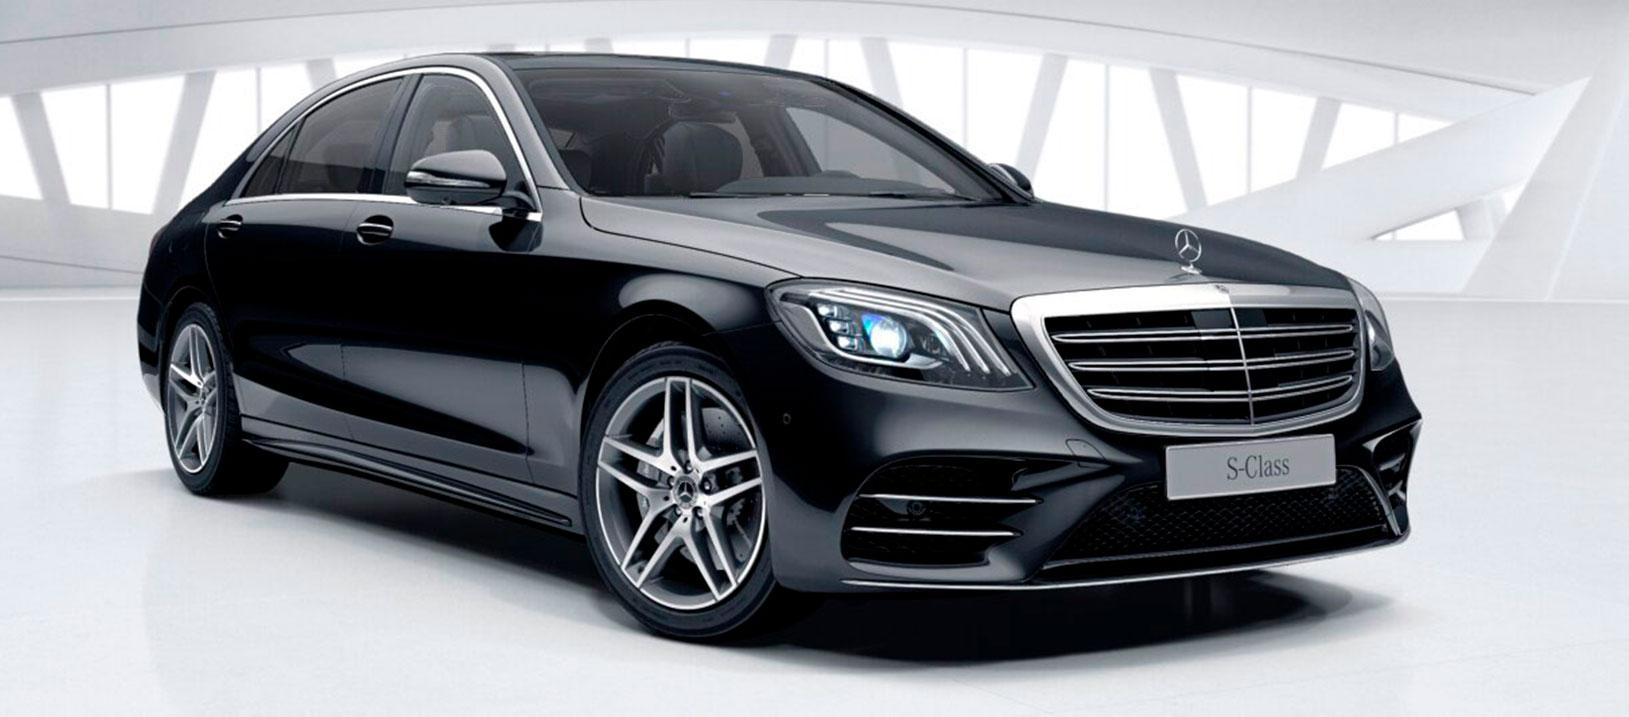 Mercedes-Benz S 350 d 4MATIC long 52600191